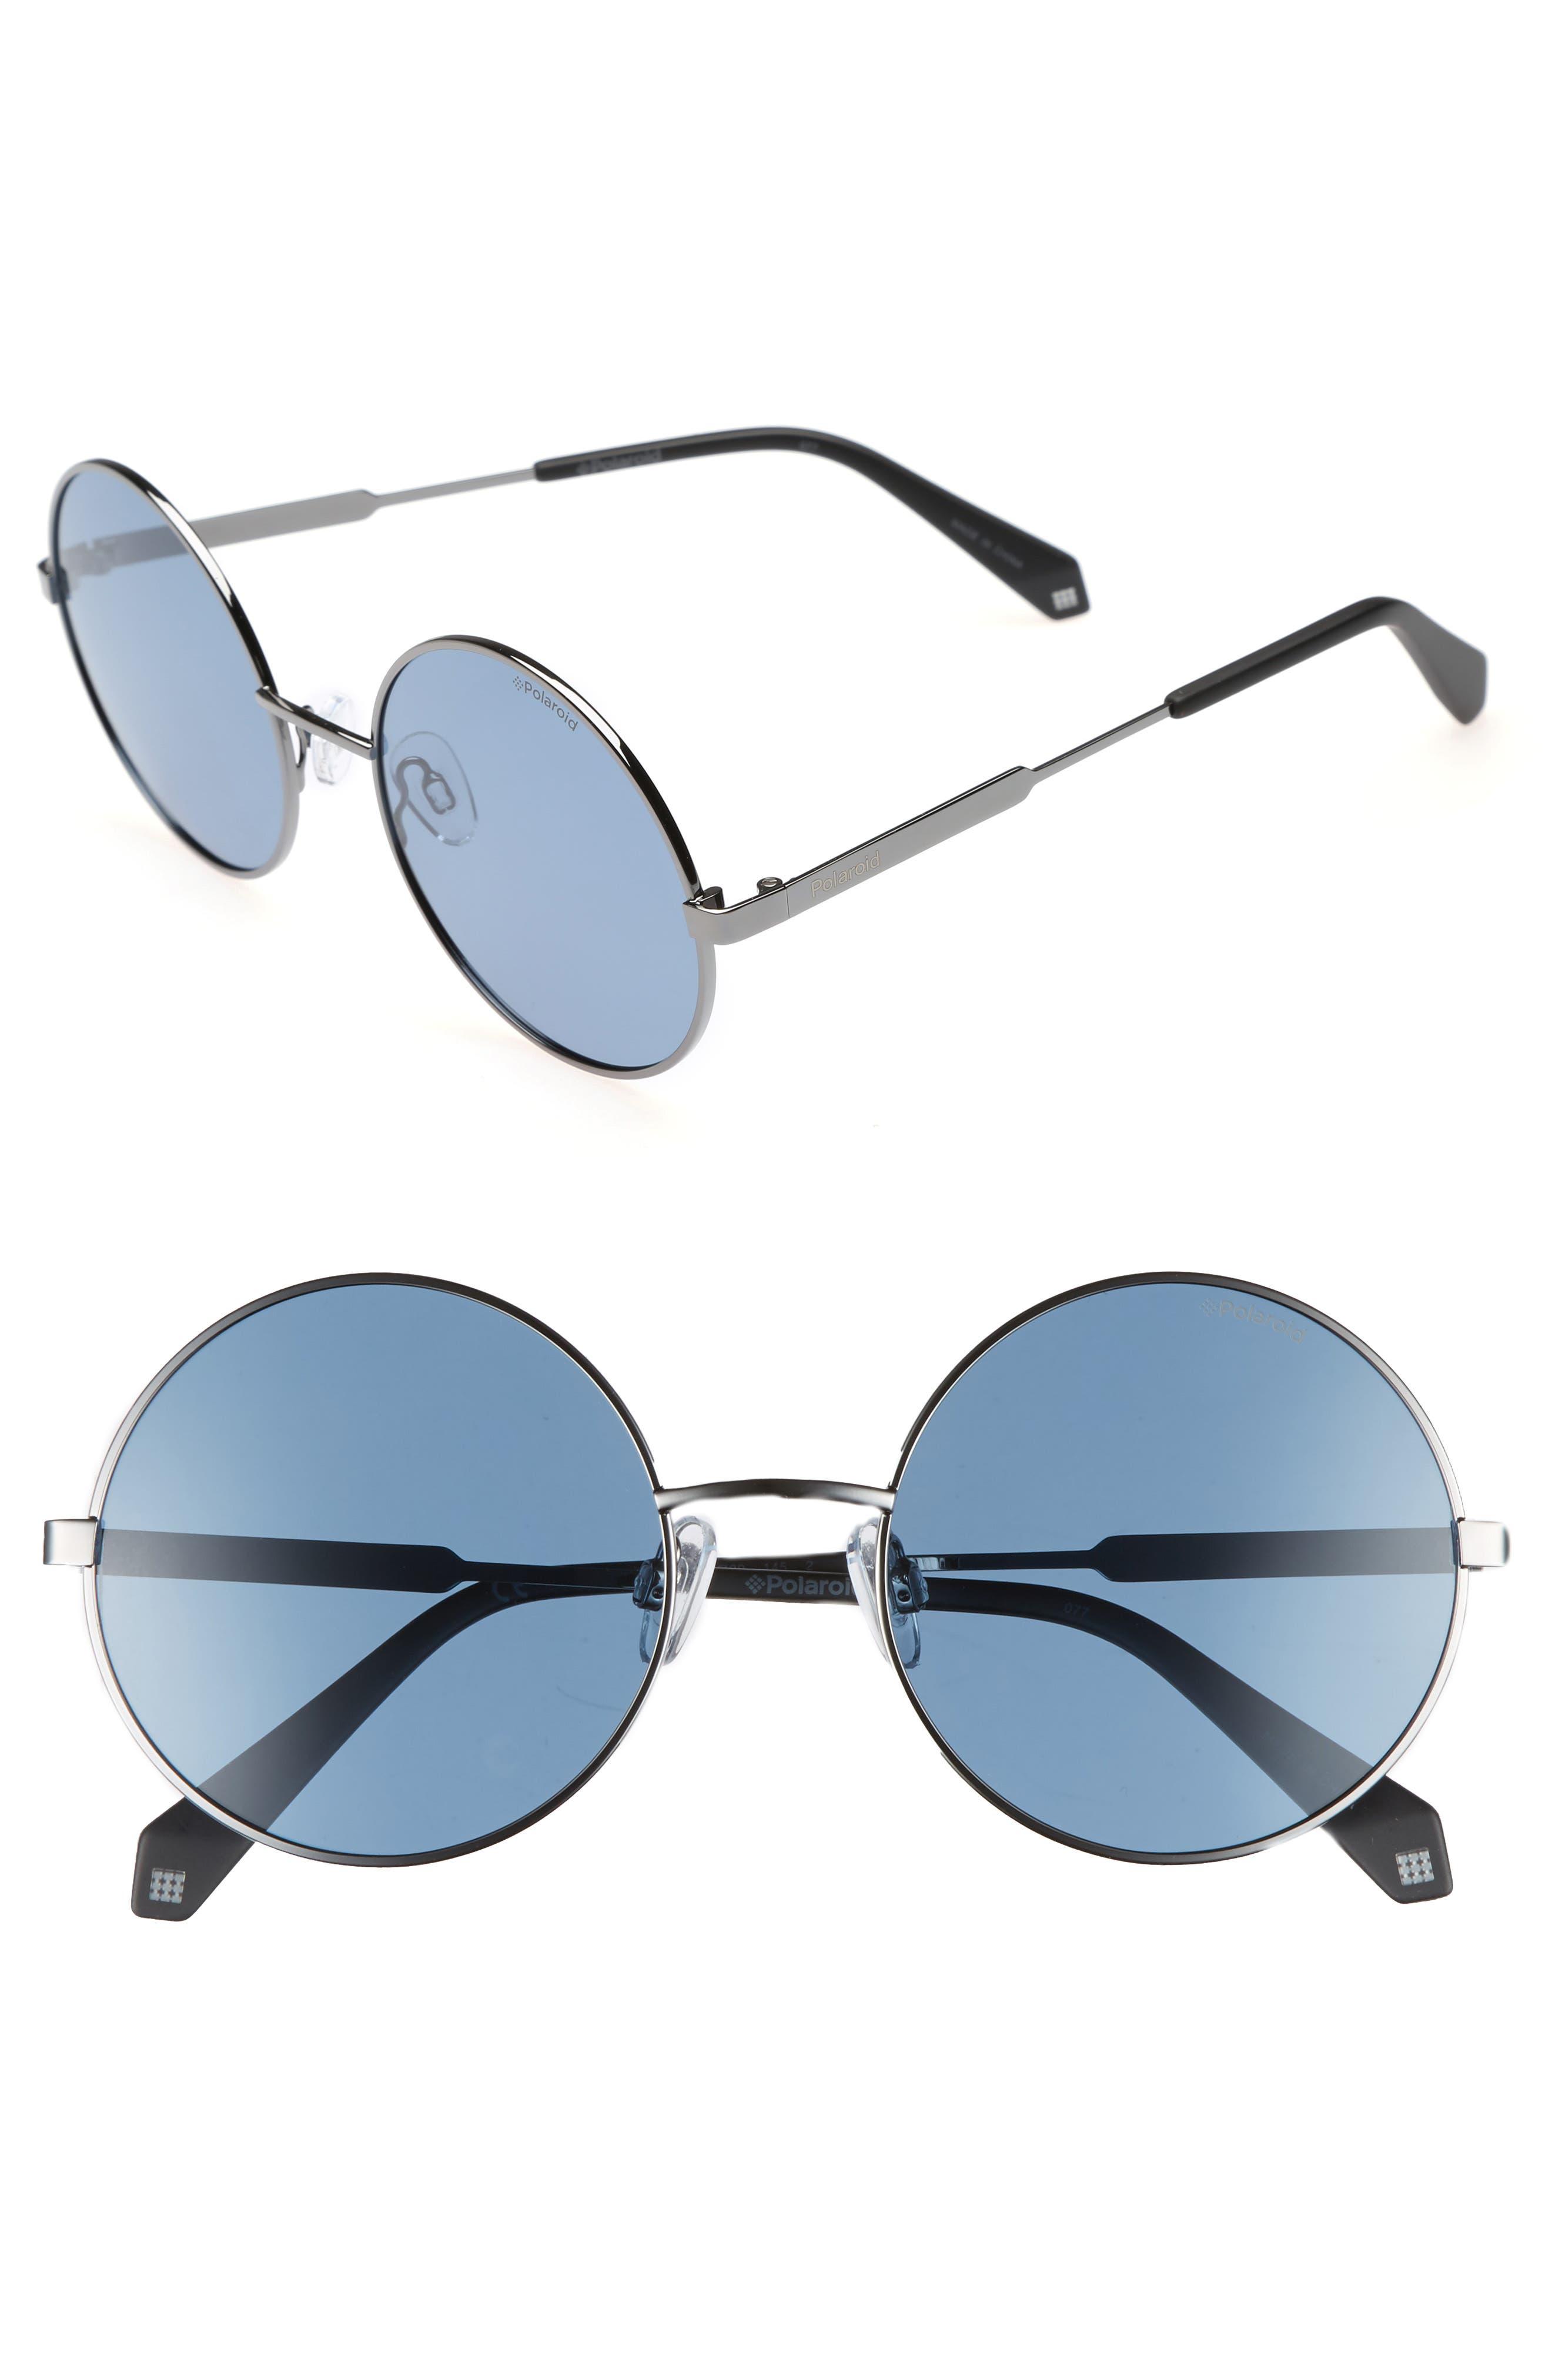 55mm Polarized Round Sunglasses,                             Main thumbnail 2, color,